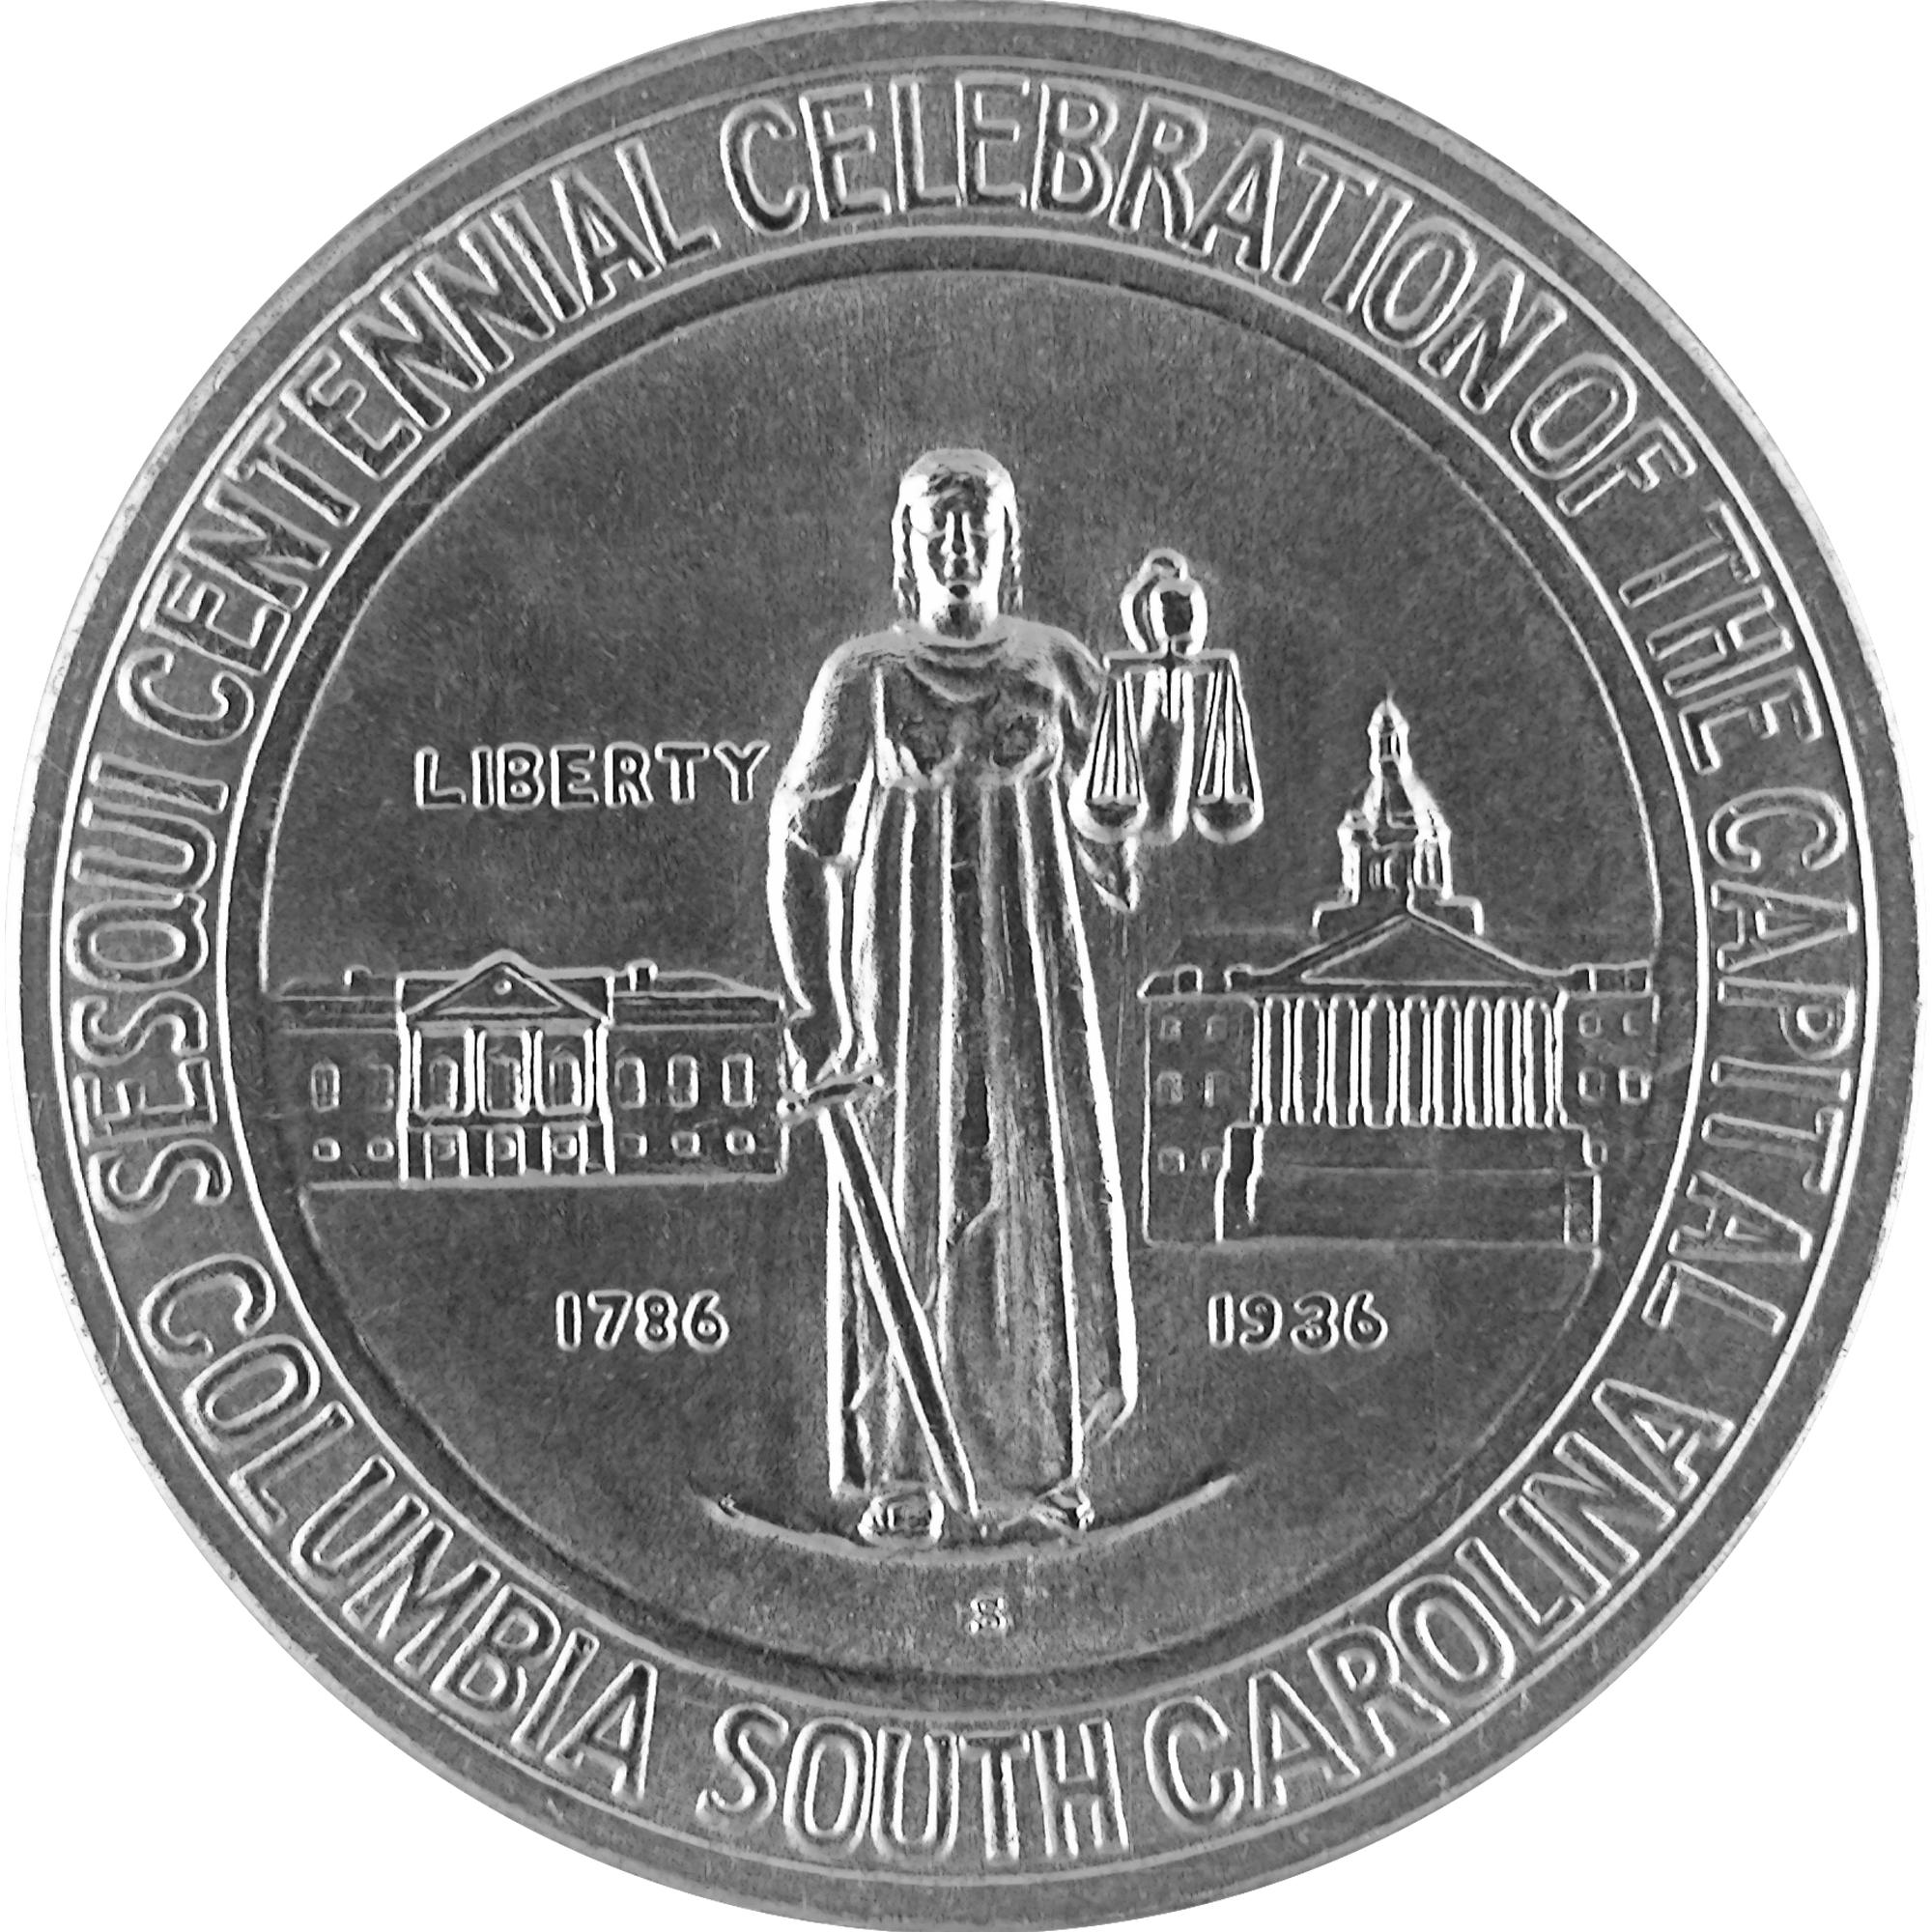 1936 Columbia South Carolina Sesquicentennial Commemorative Silver Half Dollar Coin Obverse